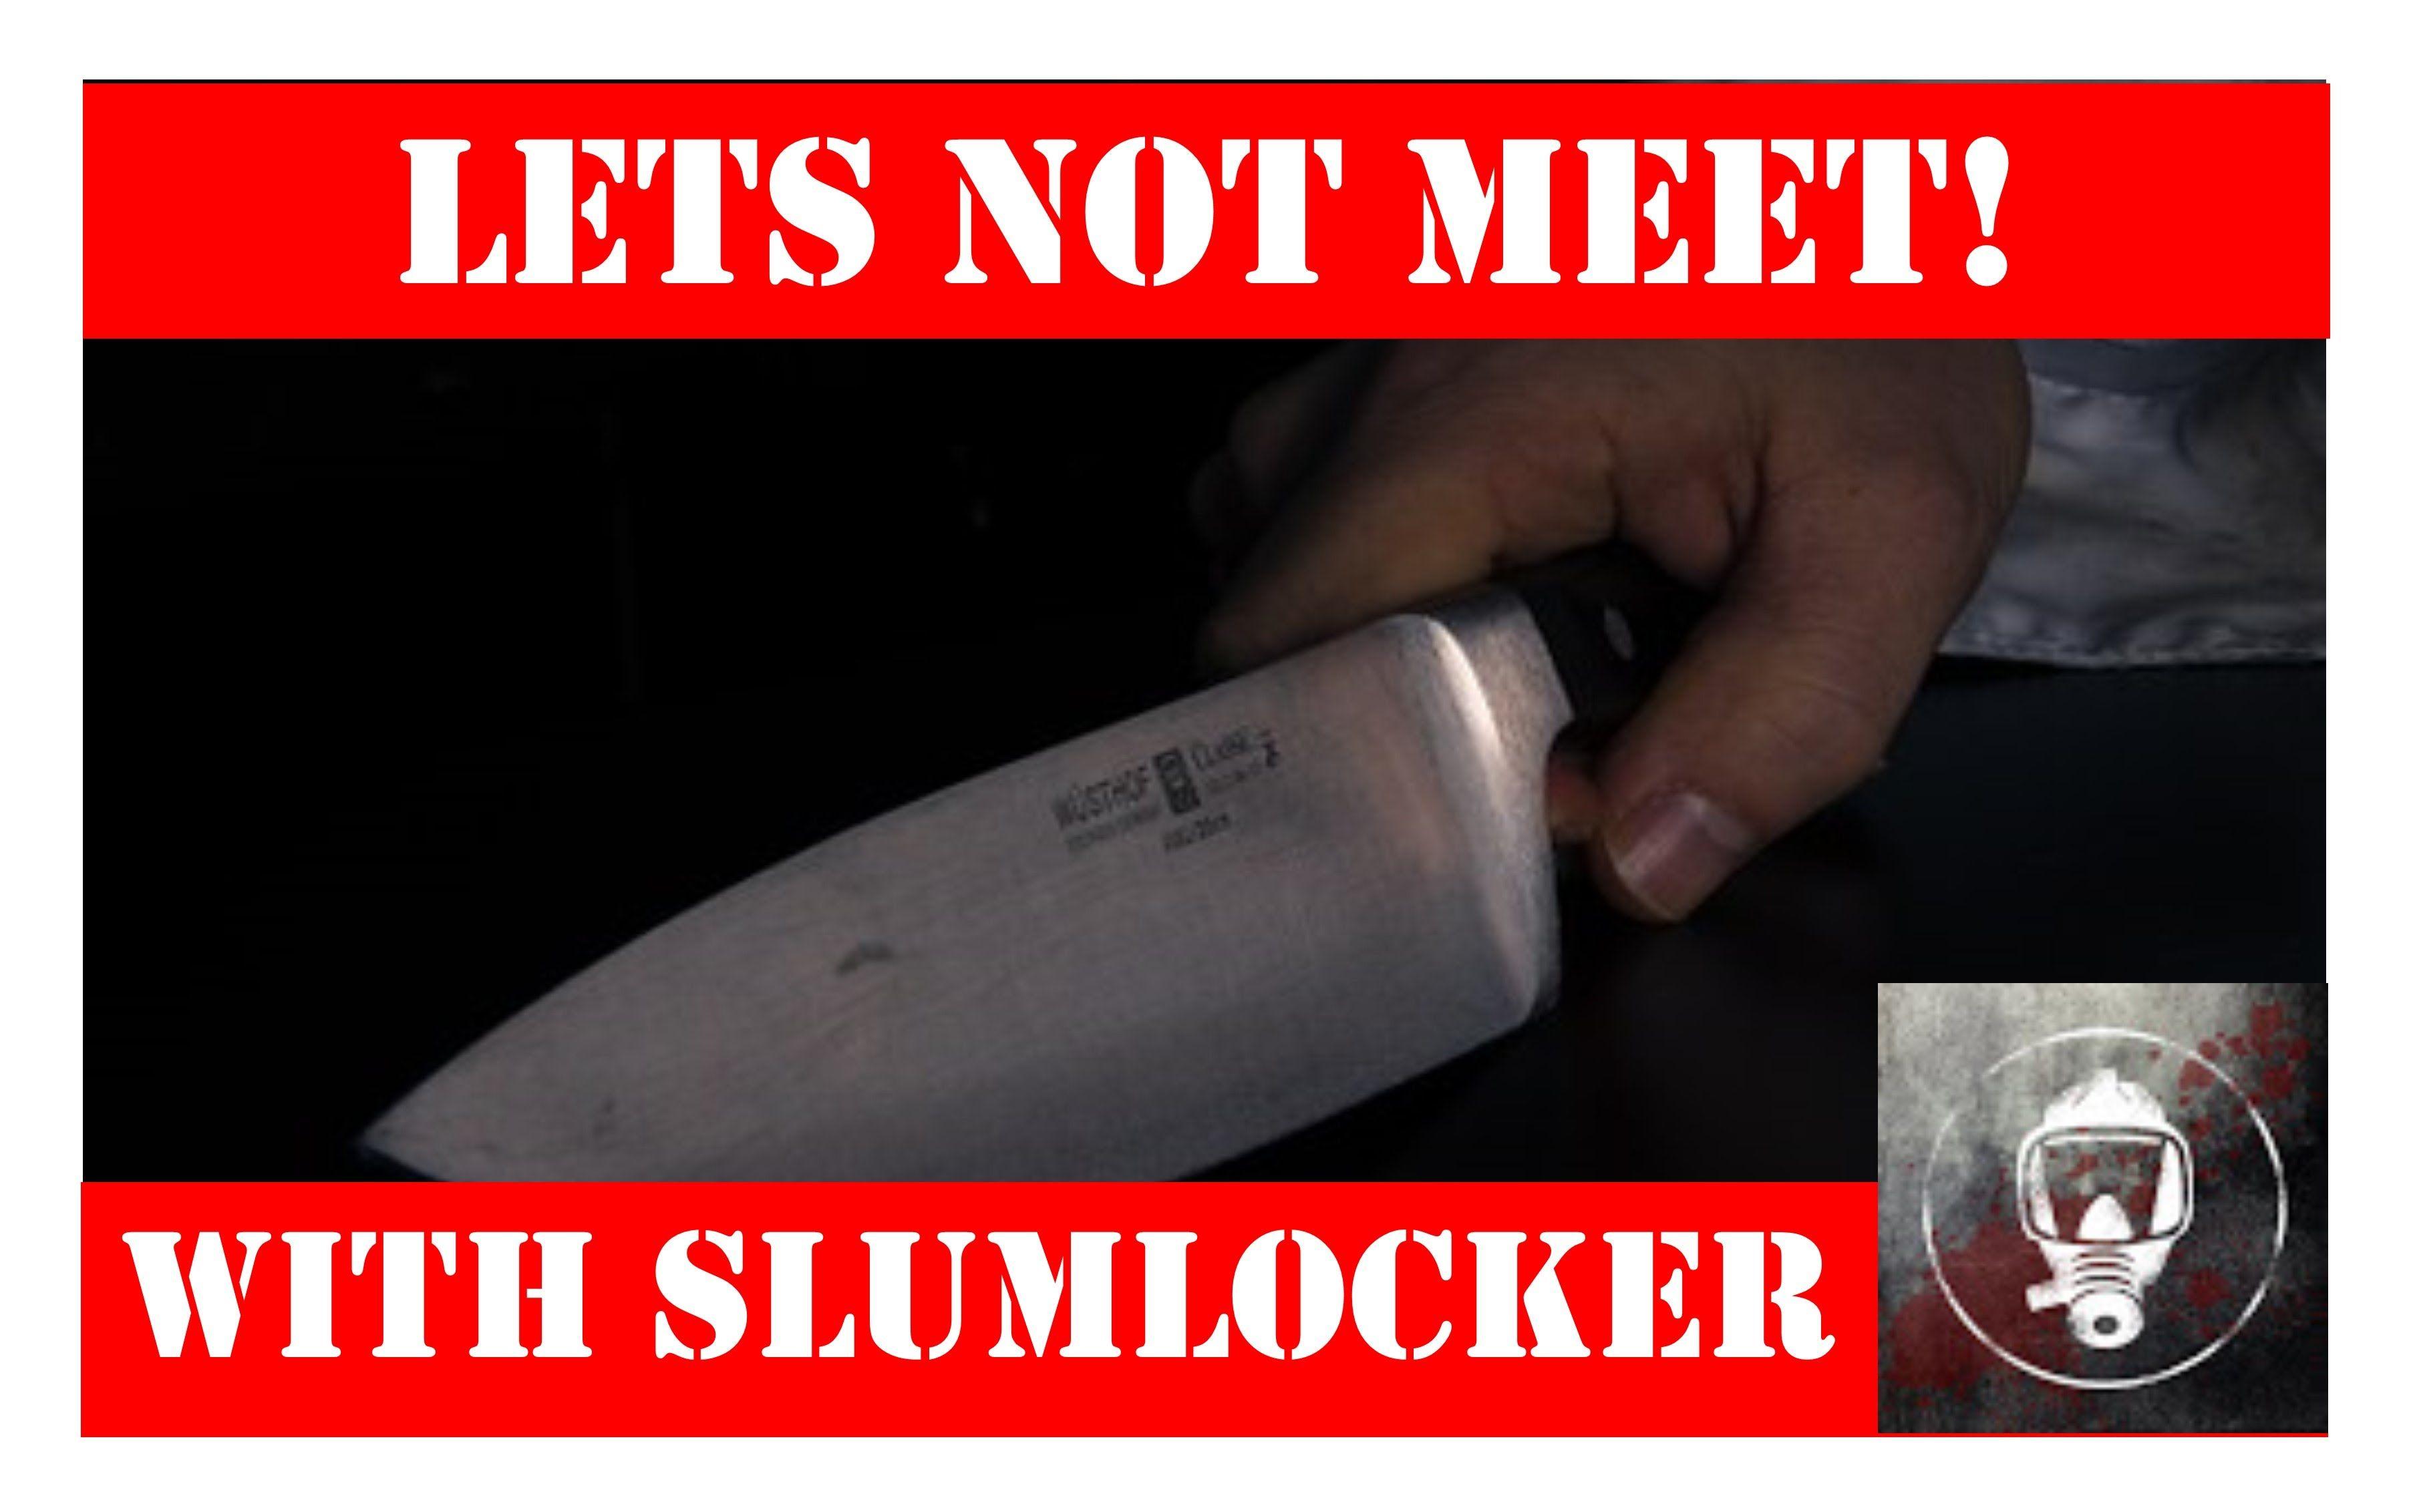 True Scary Stories Reddit LetsNotMeet ft. Slumlocker Collaboration 1  Video - https://www.youtube.com/watch?v=DORDfOxPc-I  Channel - https://www.youtube.com/channel/UCg5ztHNqFKgaJGOMwDglwWw  Website - http://midnightfears.com